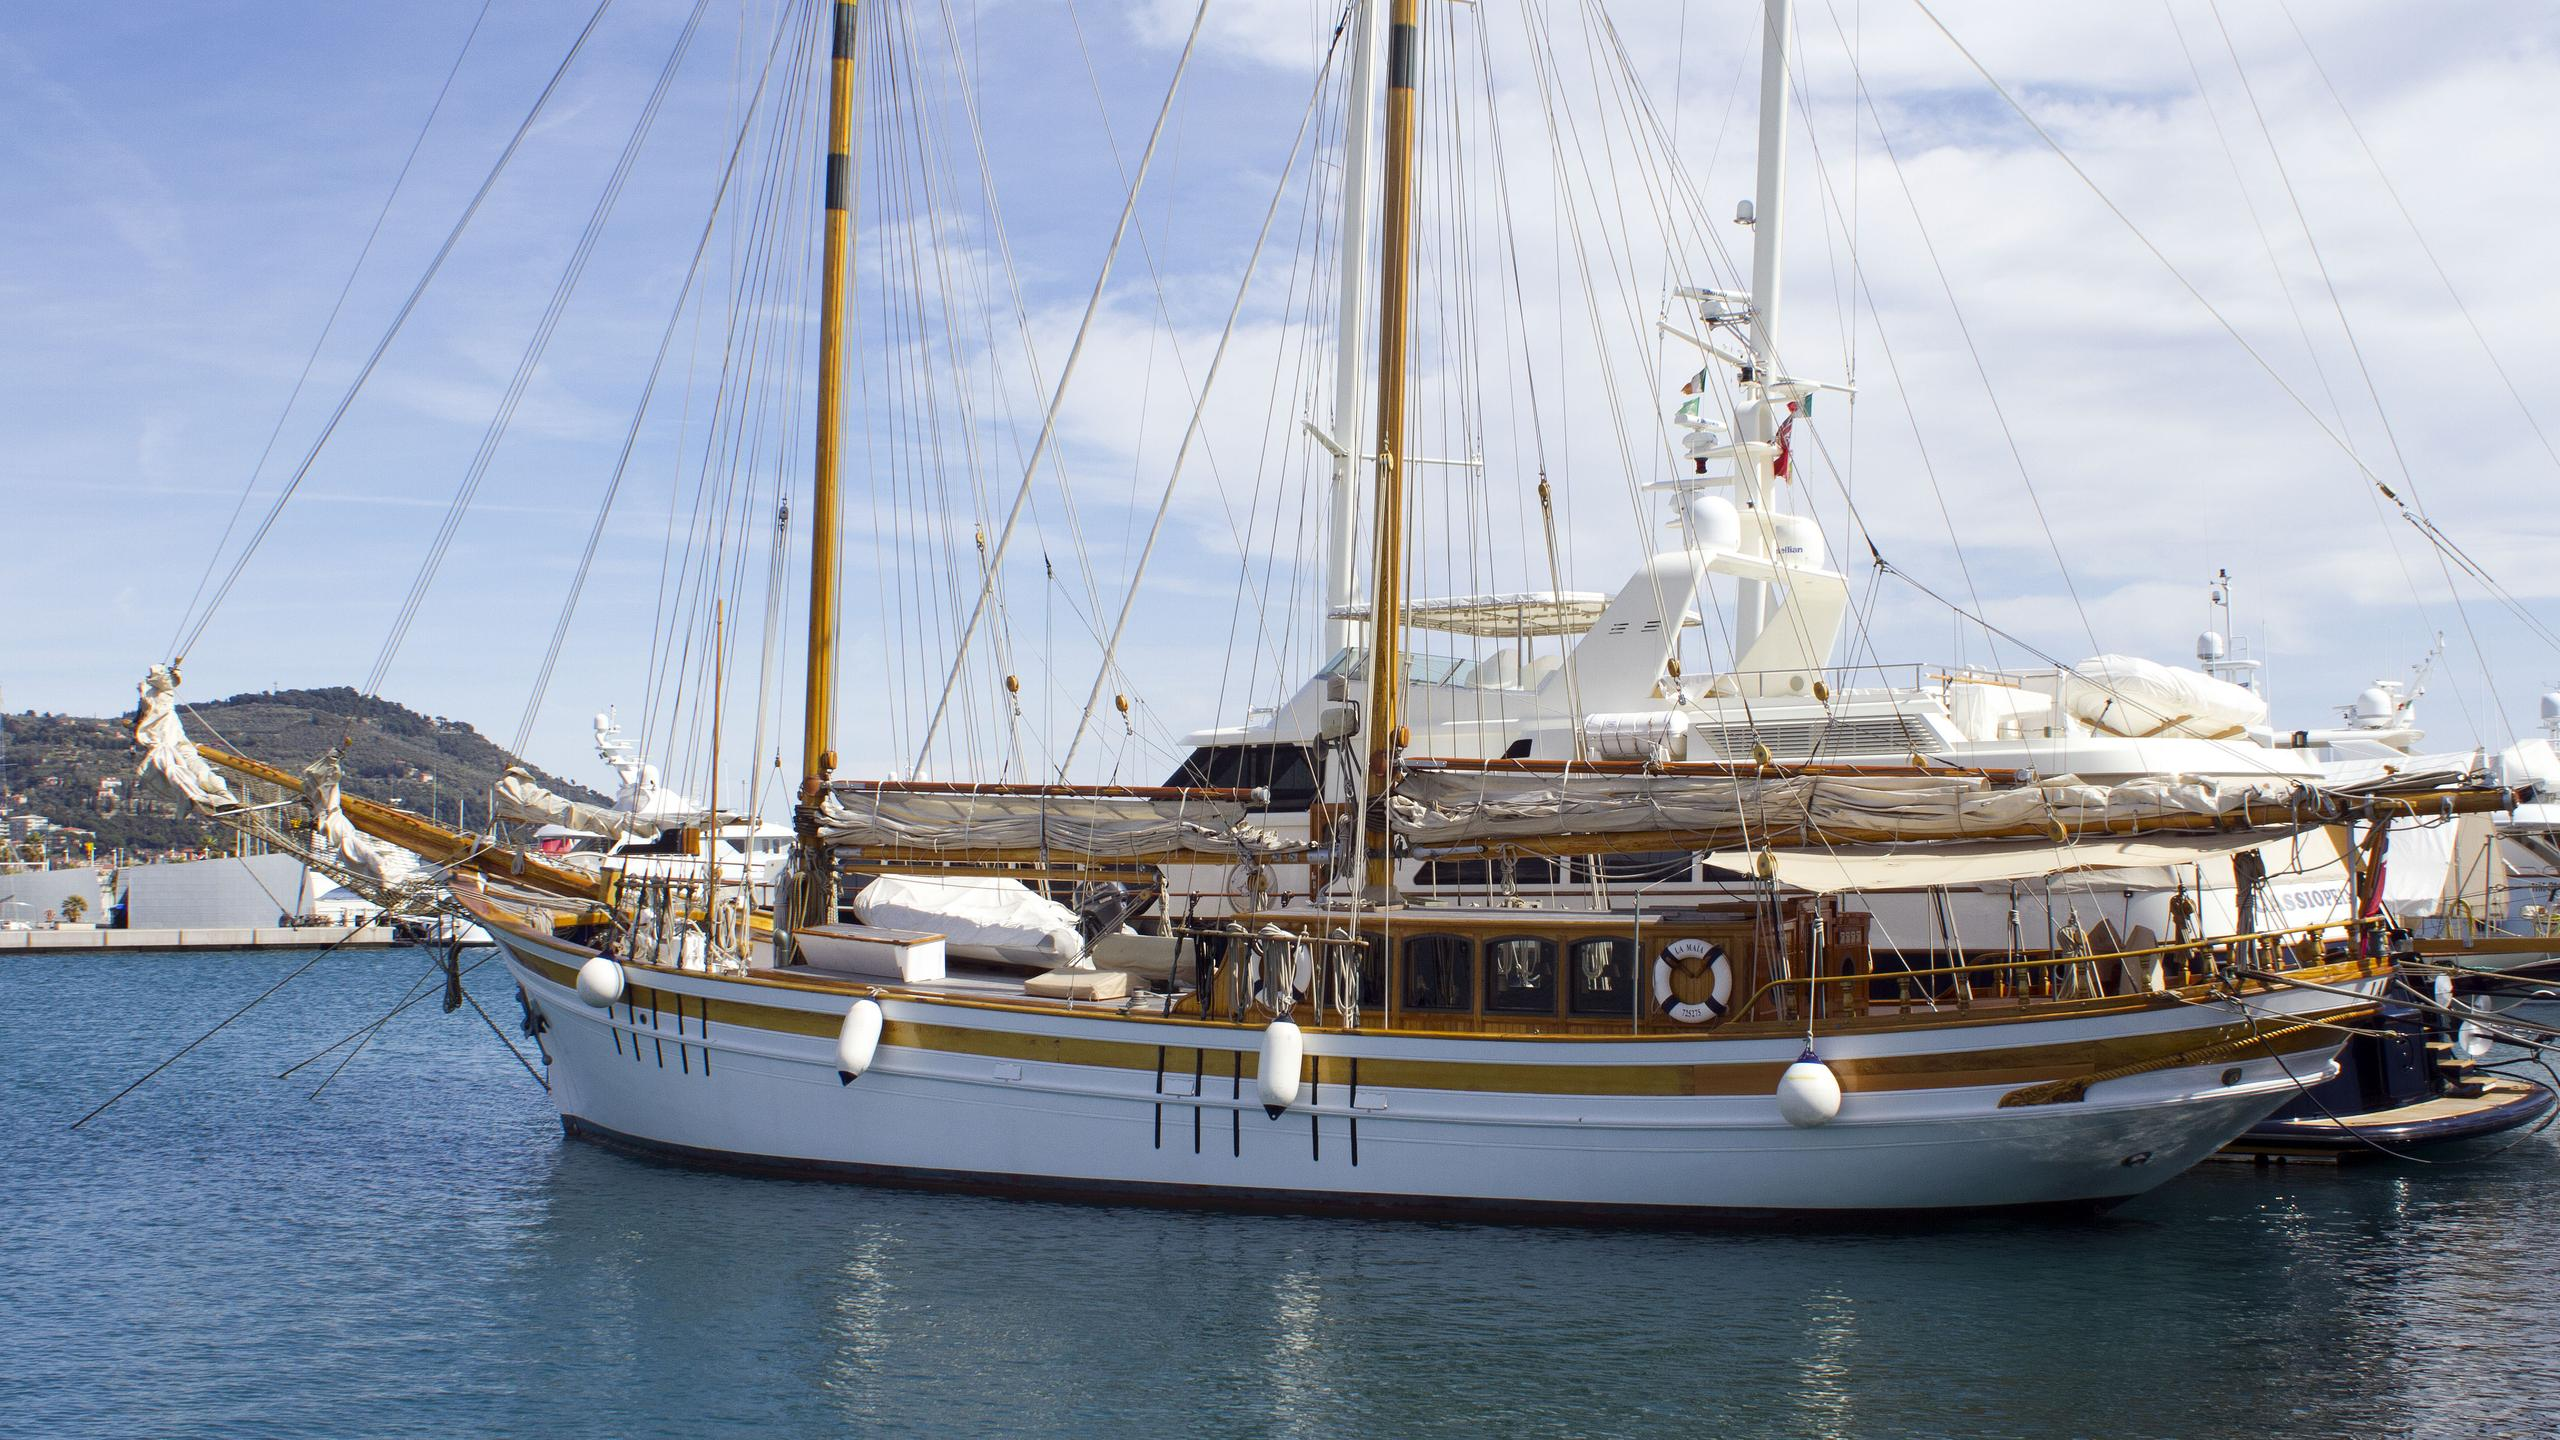 la-maia-sailing-yacht-psaros-1956-32m-profile